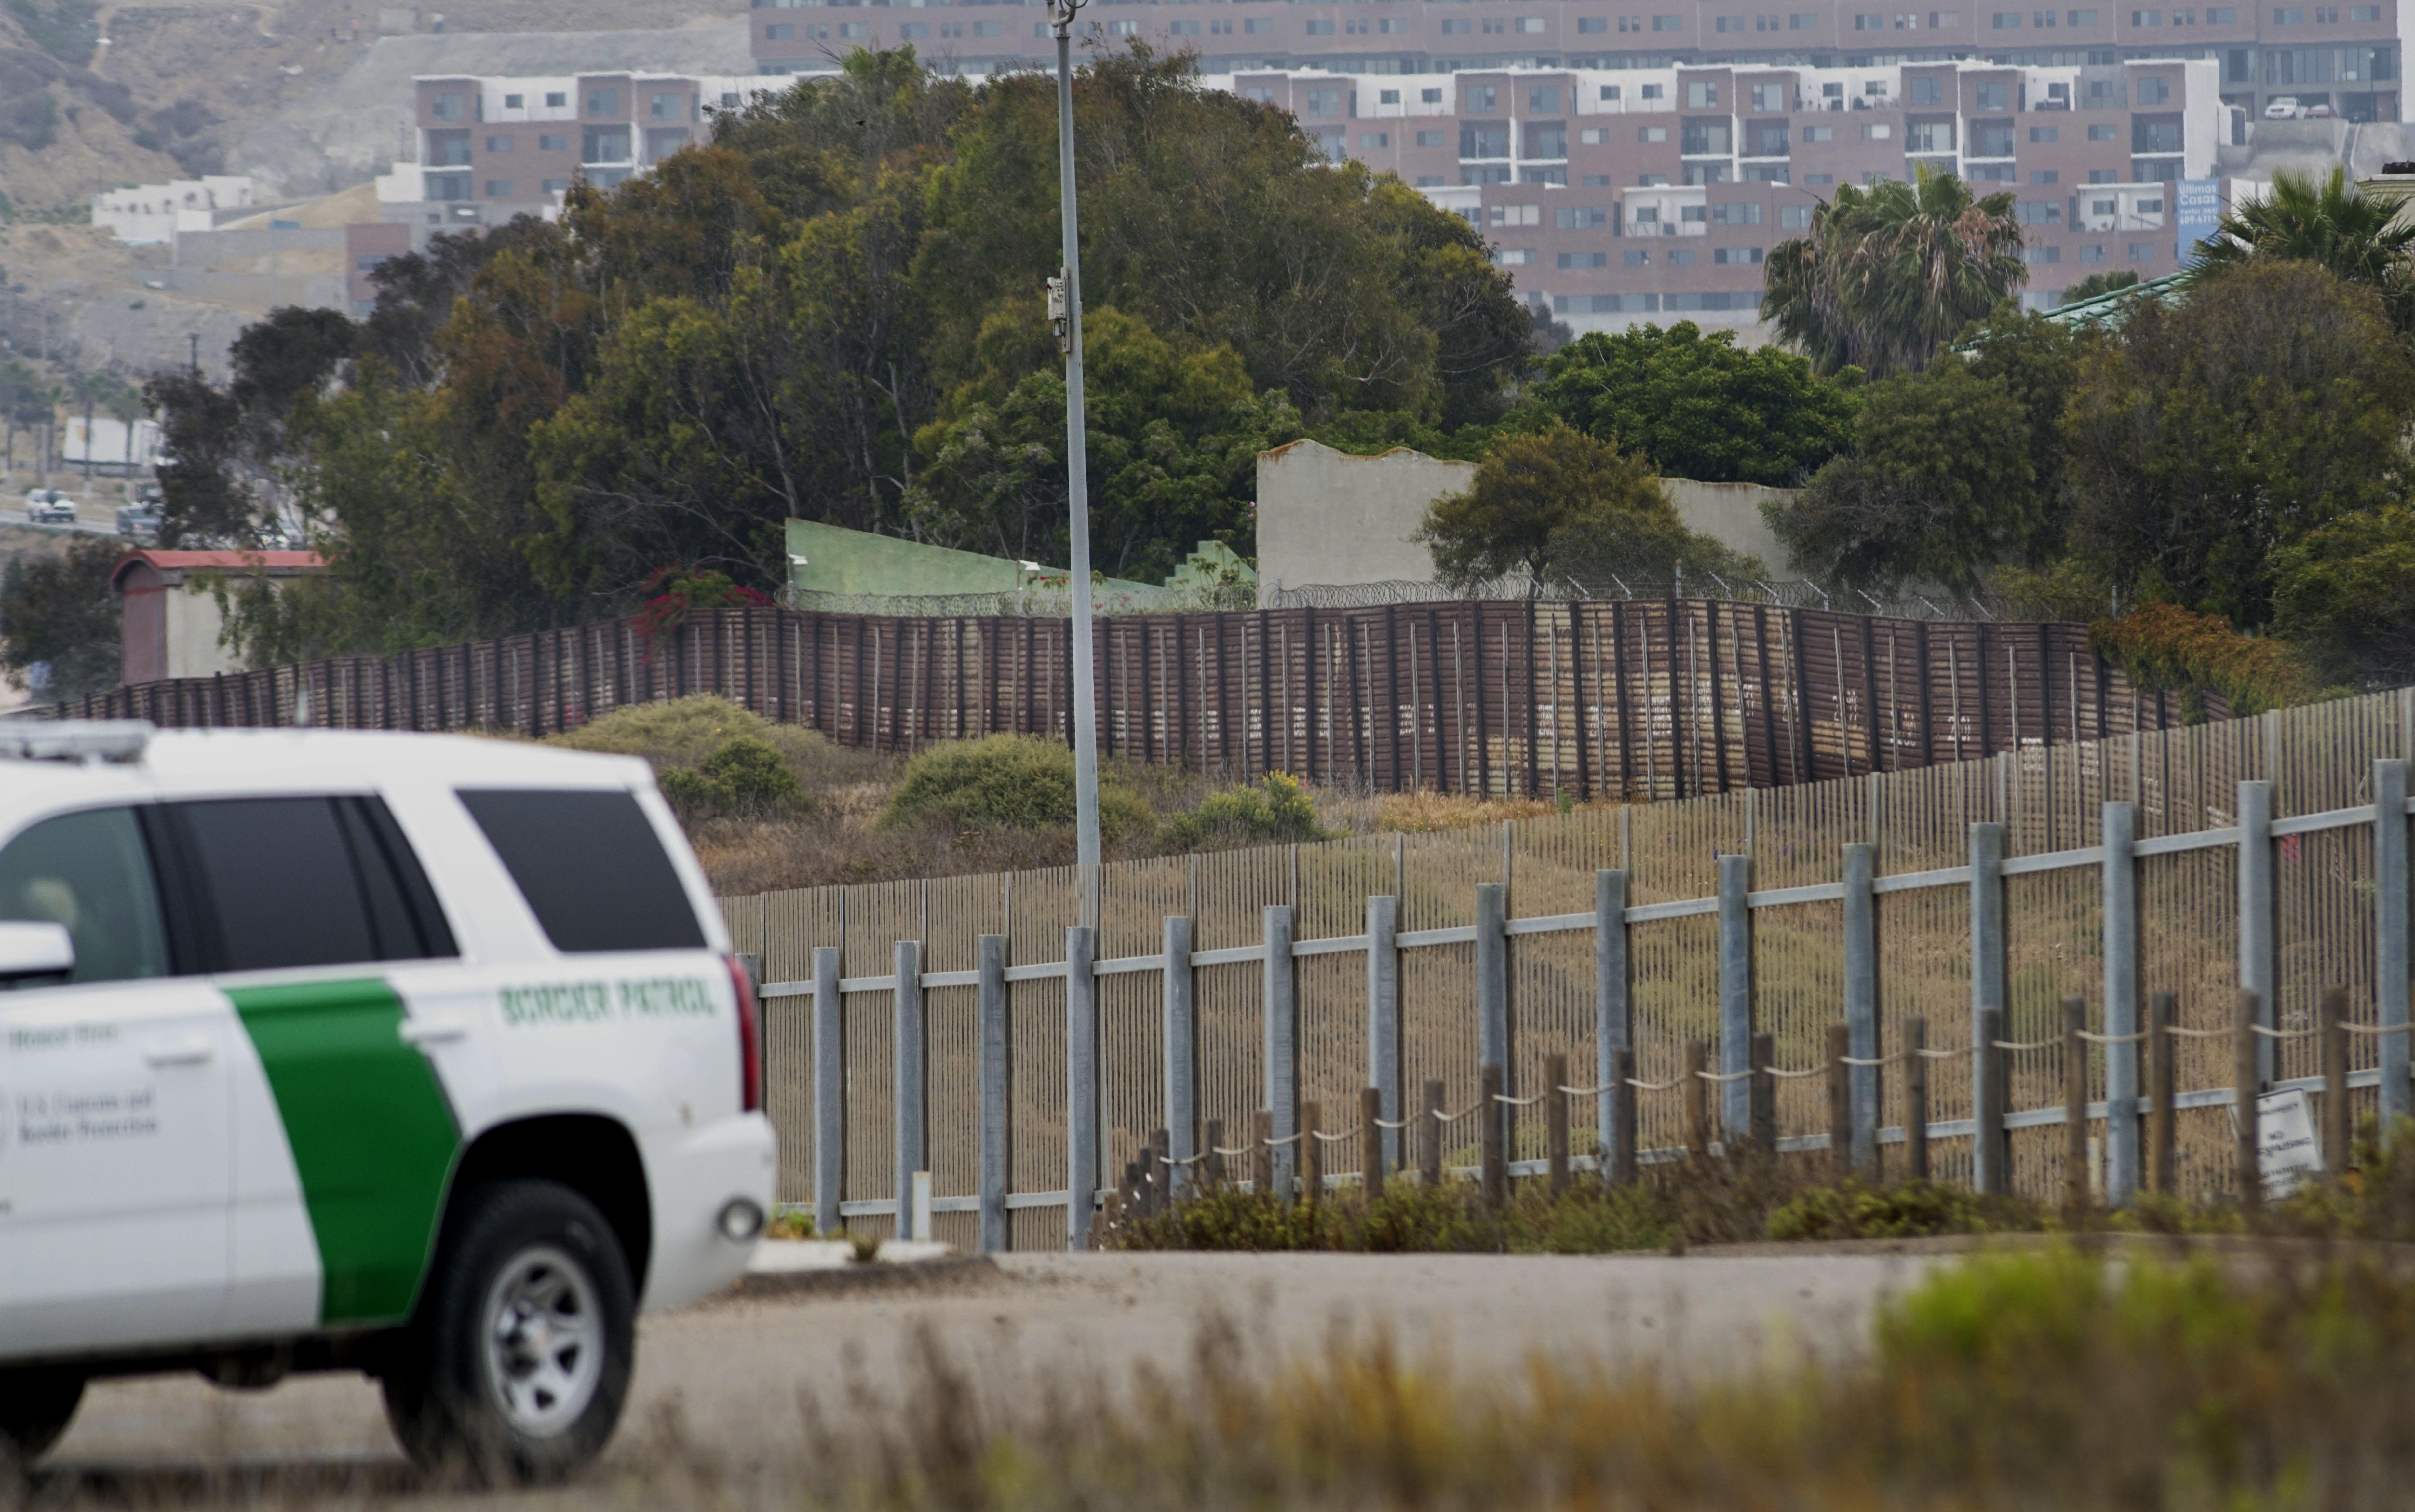 US-MEXICO-POLITICS-SECURITY-BORDER